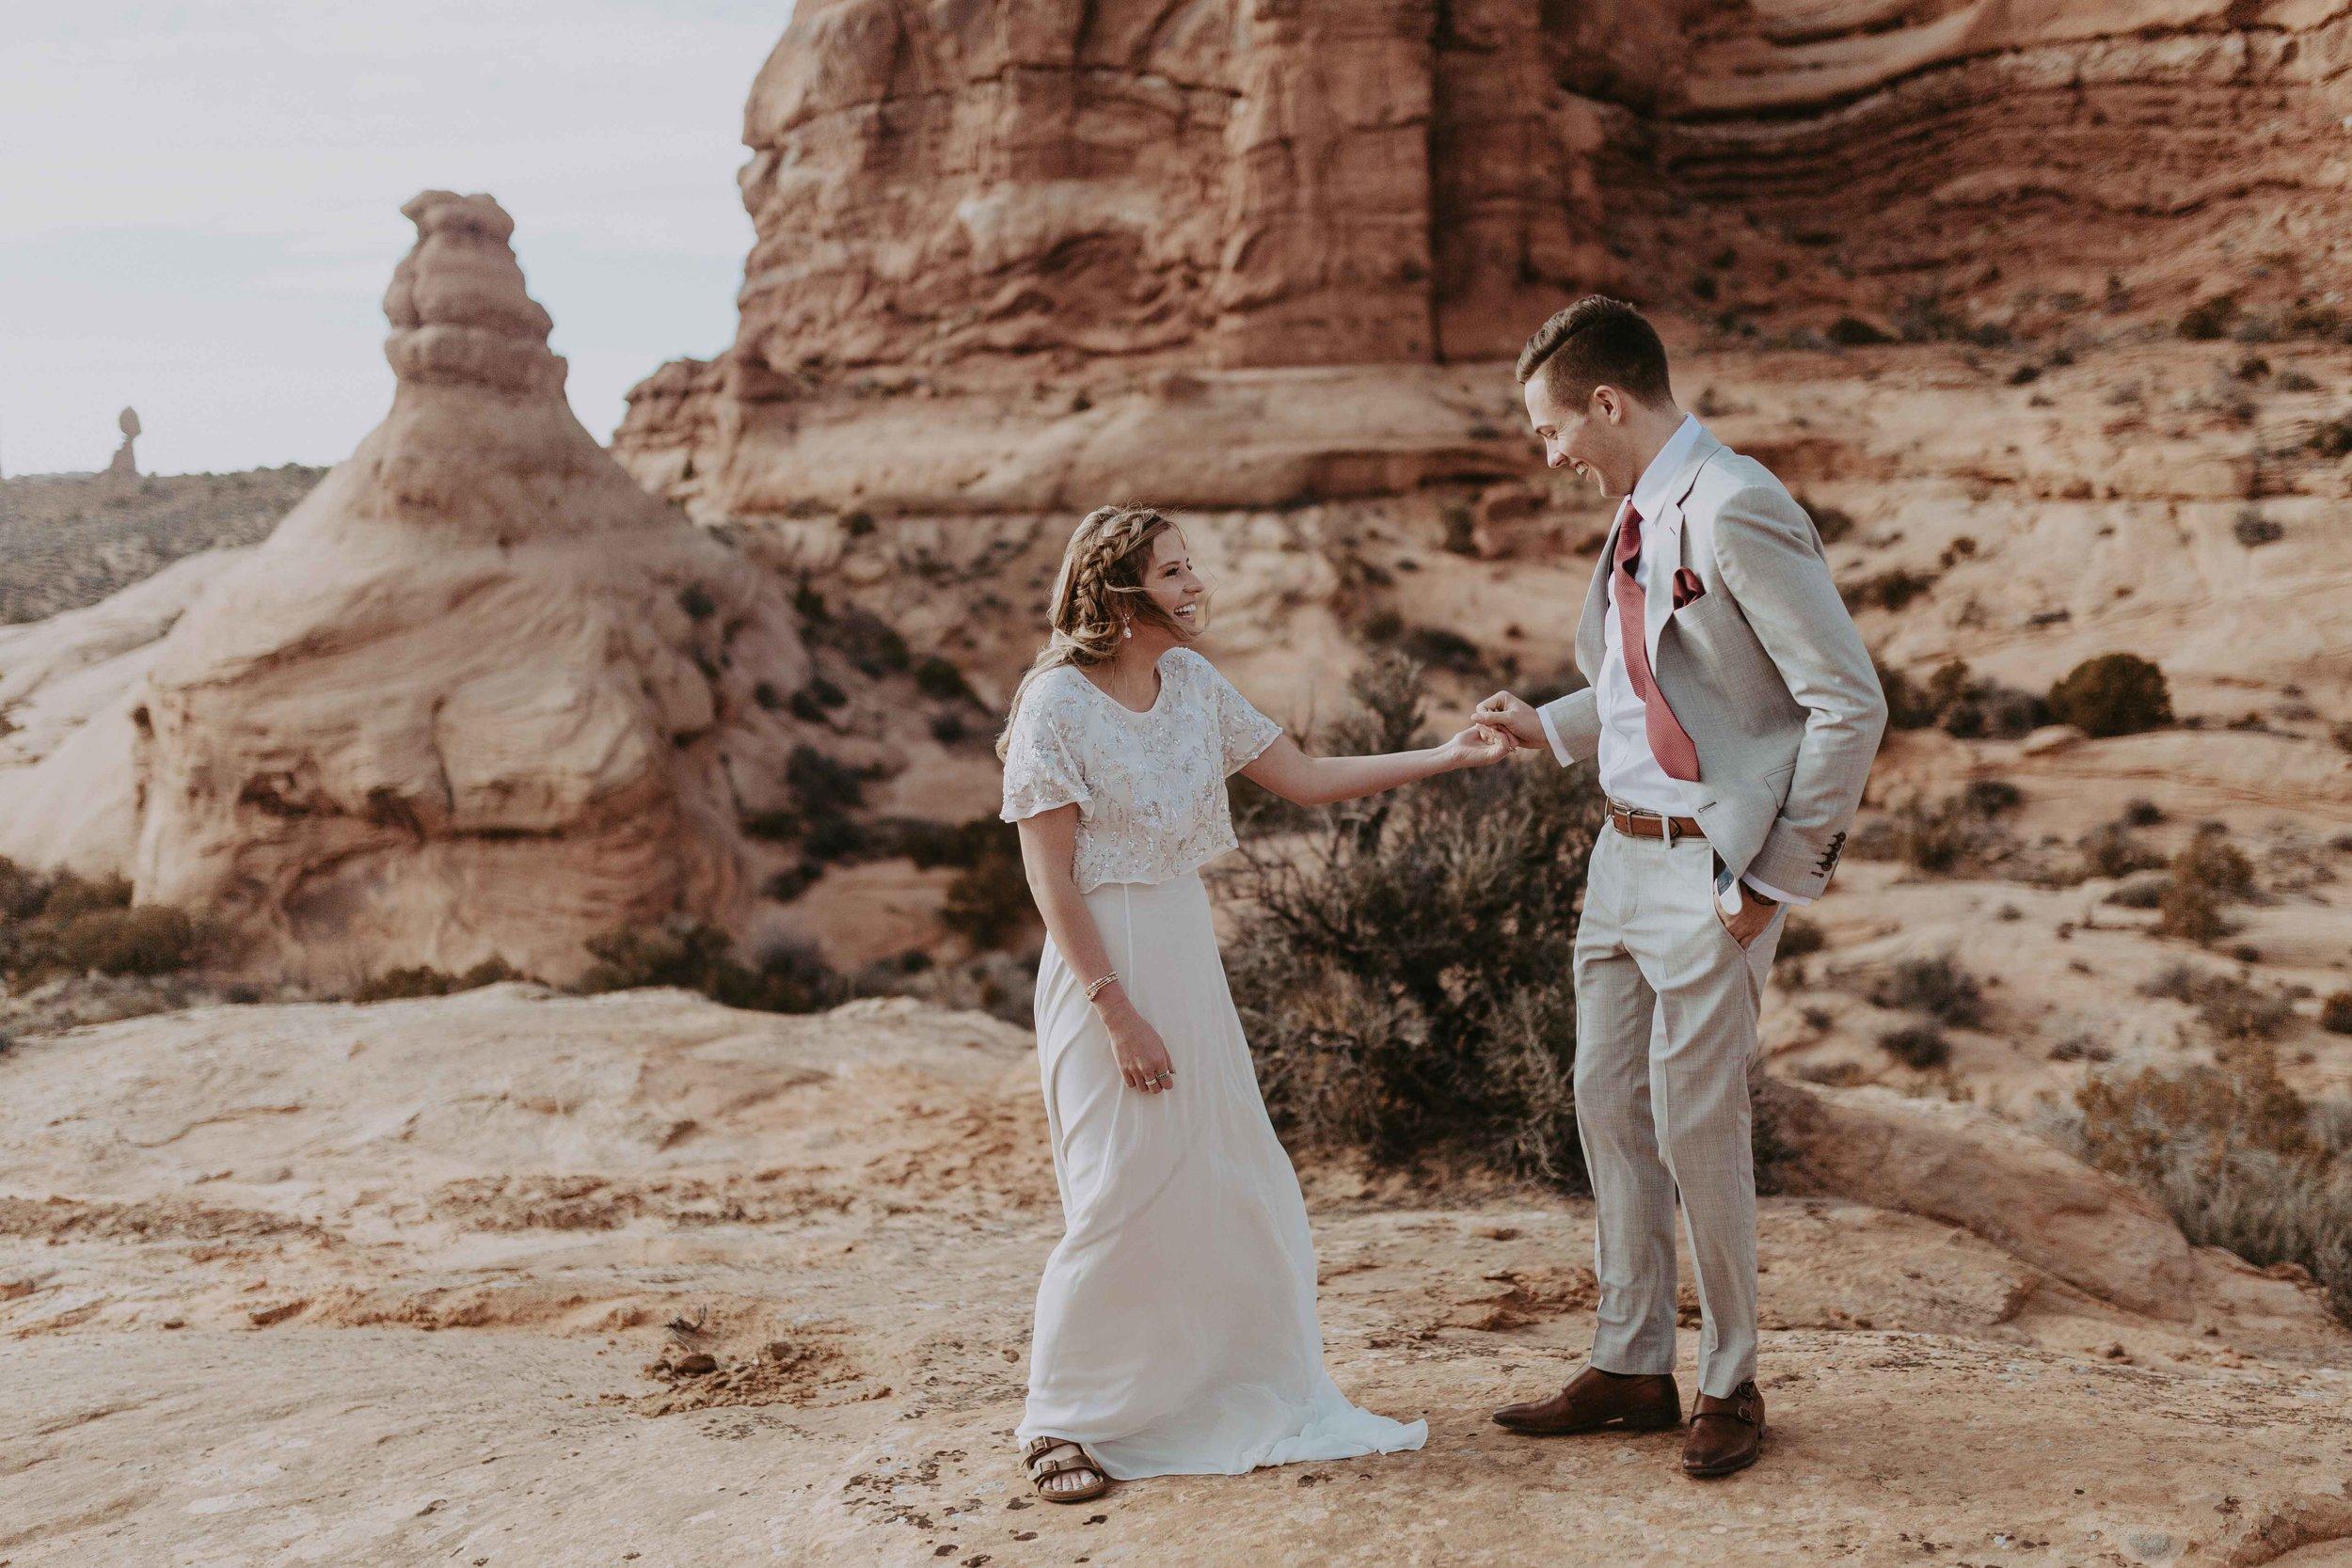 moab-wedding-photographer-6.jpg